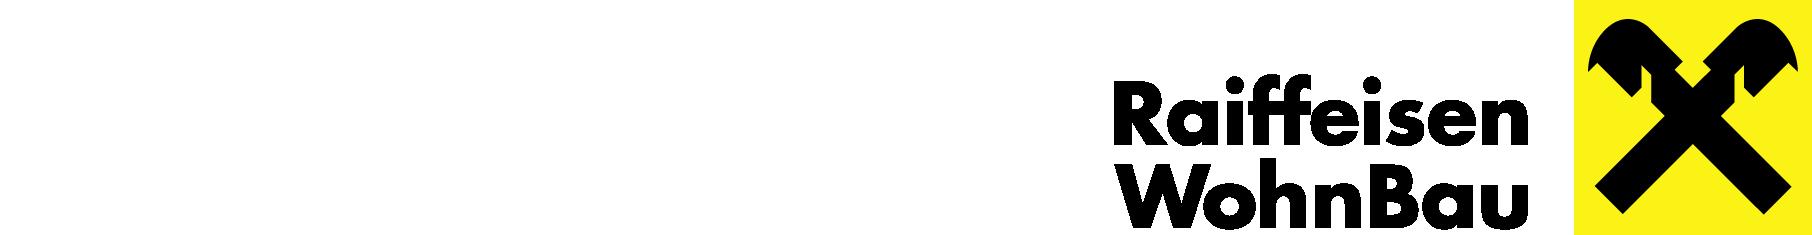 Banken Logo